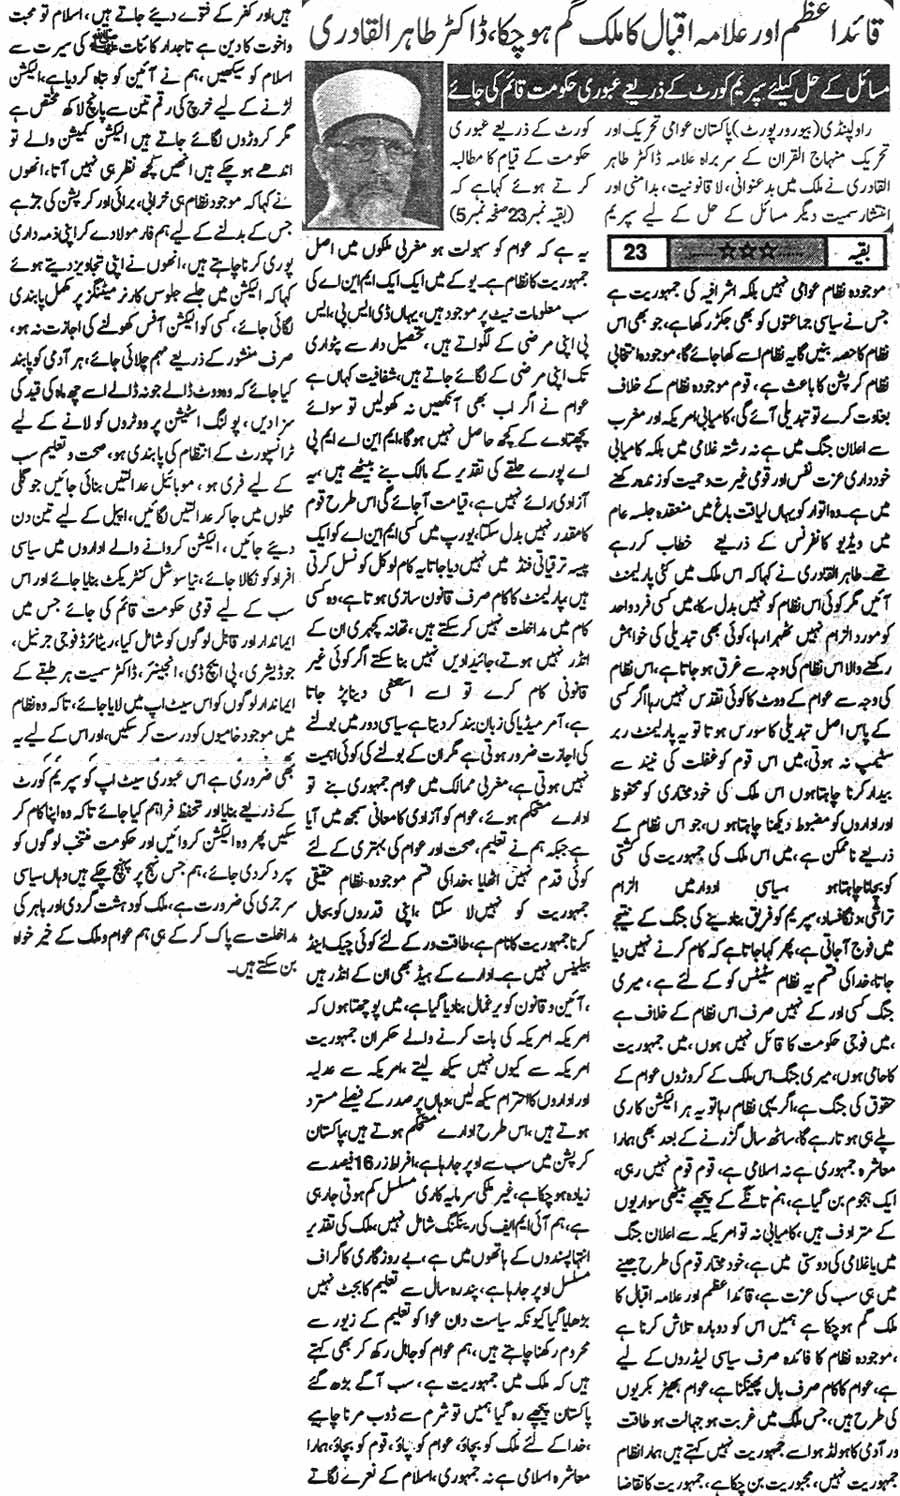 تحریک منہاج القرآن Minhaj-ul-Quran  Print Media Coverage پرنٹ میڈیا کوریج Daily Istehkam Front Page